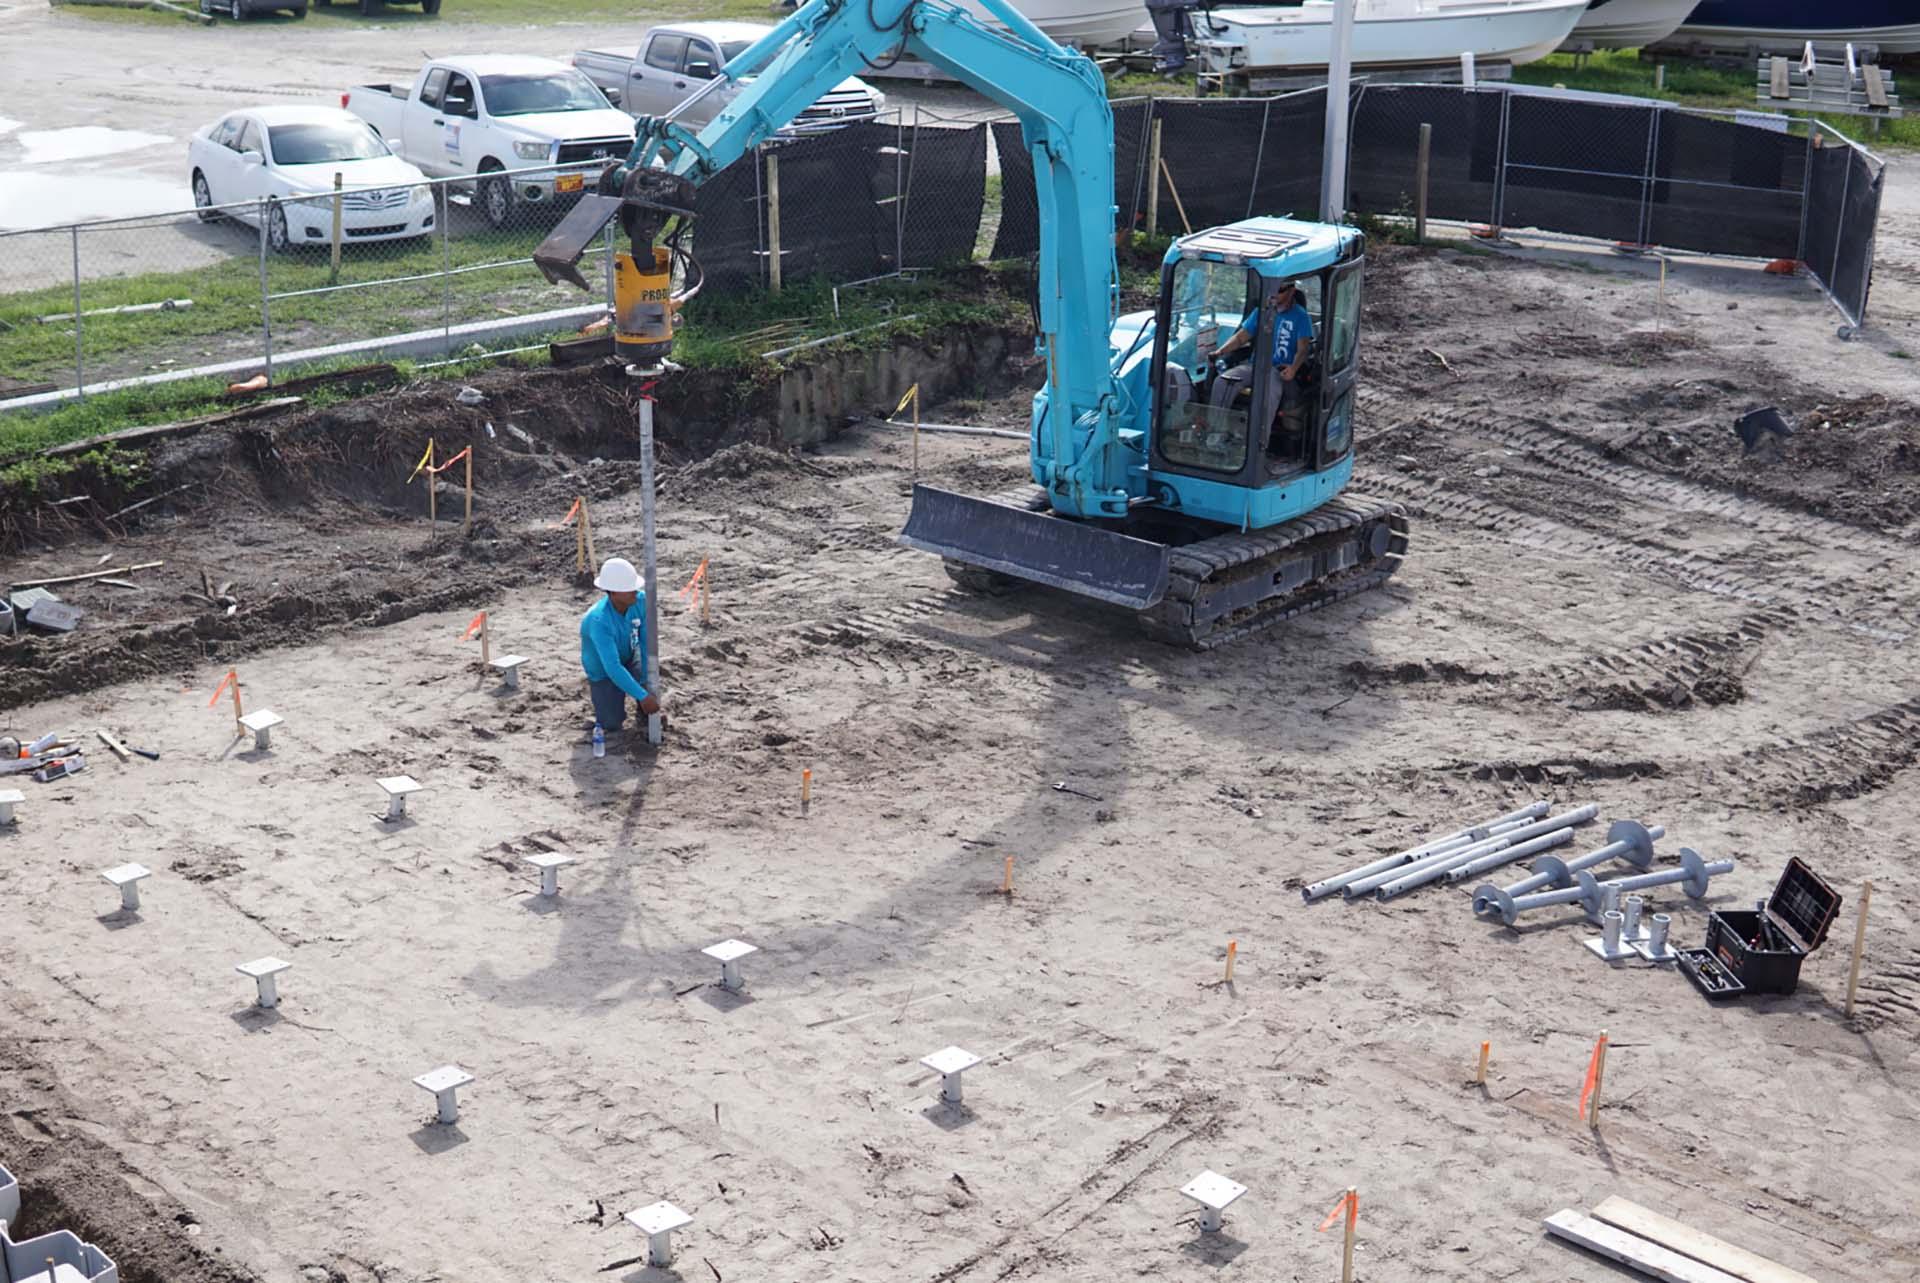 https://coastalfoundationsolutions.com/wp-content/uploads/2019/03/helical-pile-foundation-installation-swfl.jpg